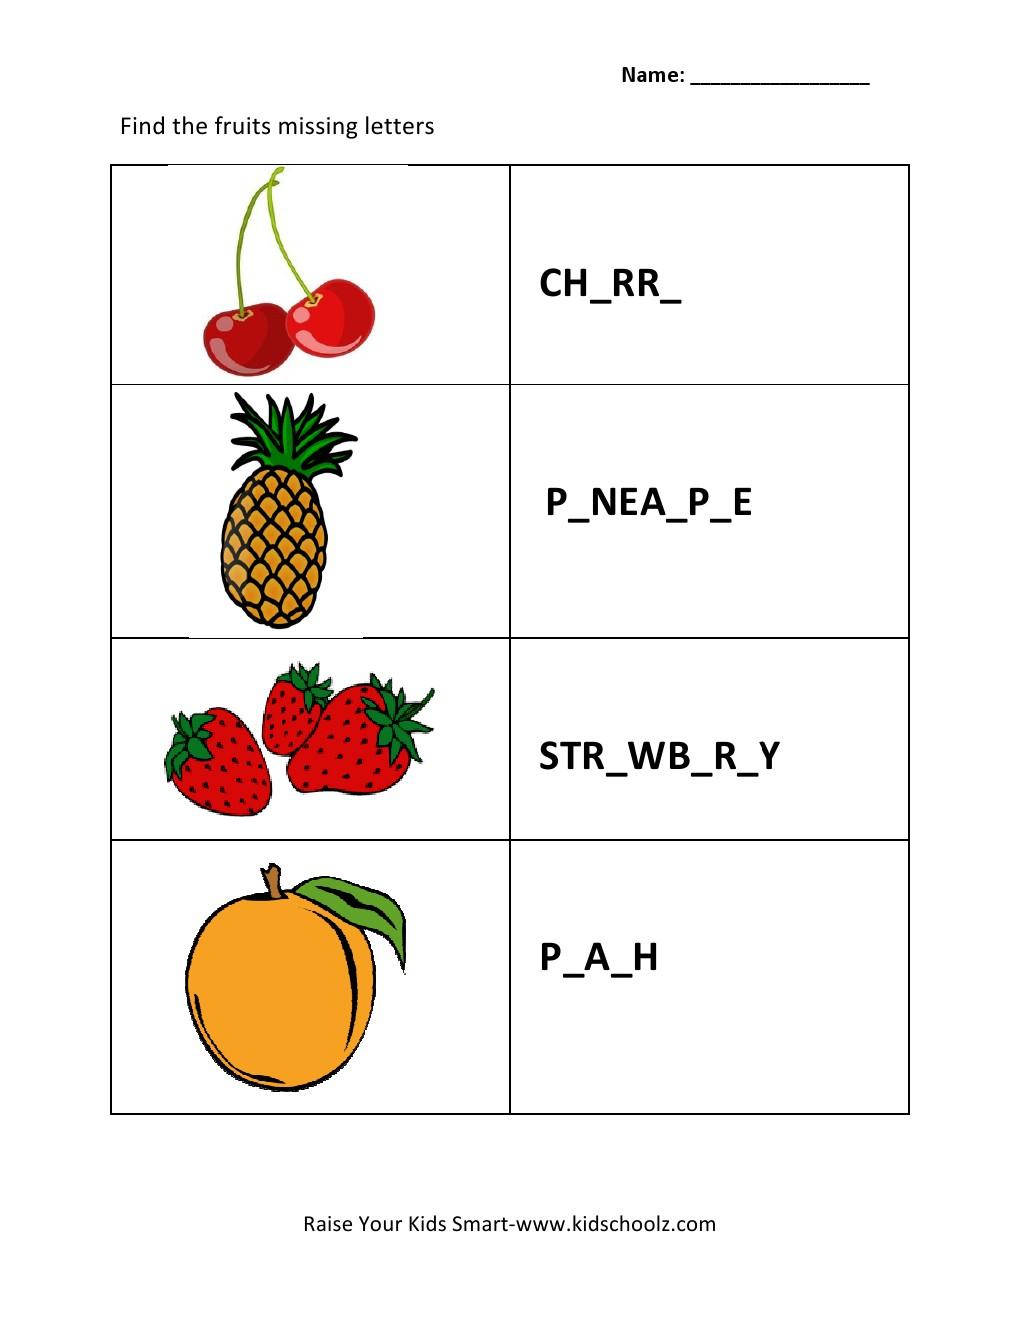 Grade 2 - Missing Letters Worksheet 2 -